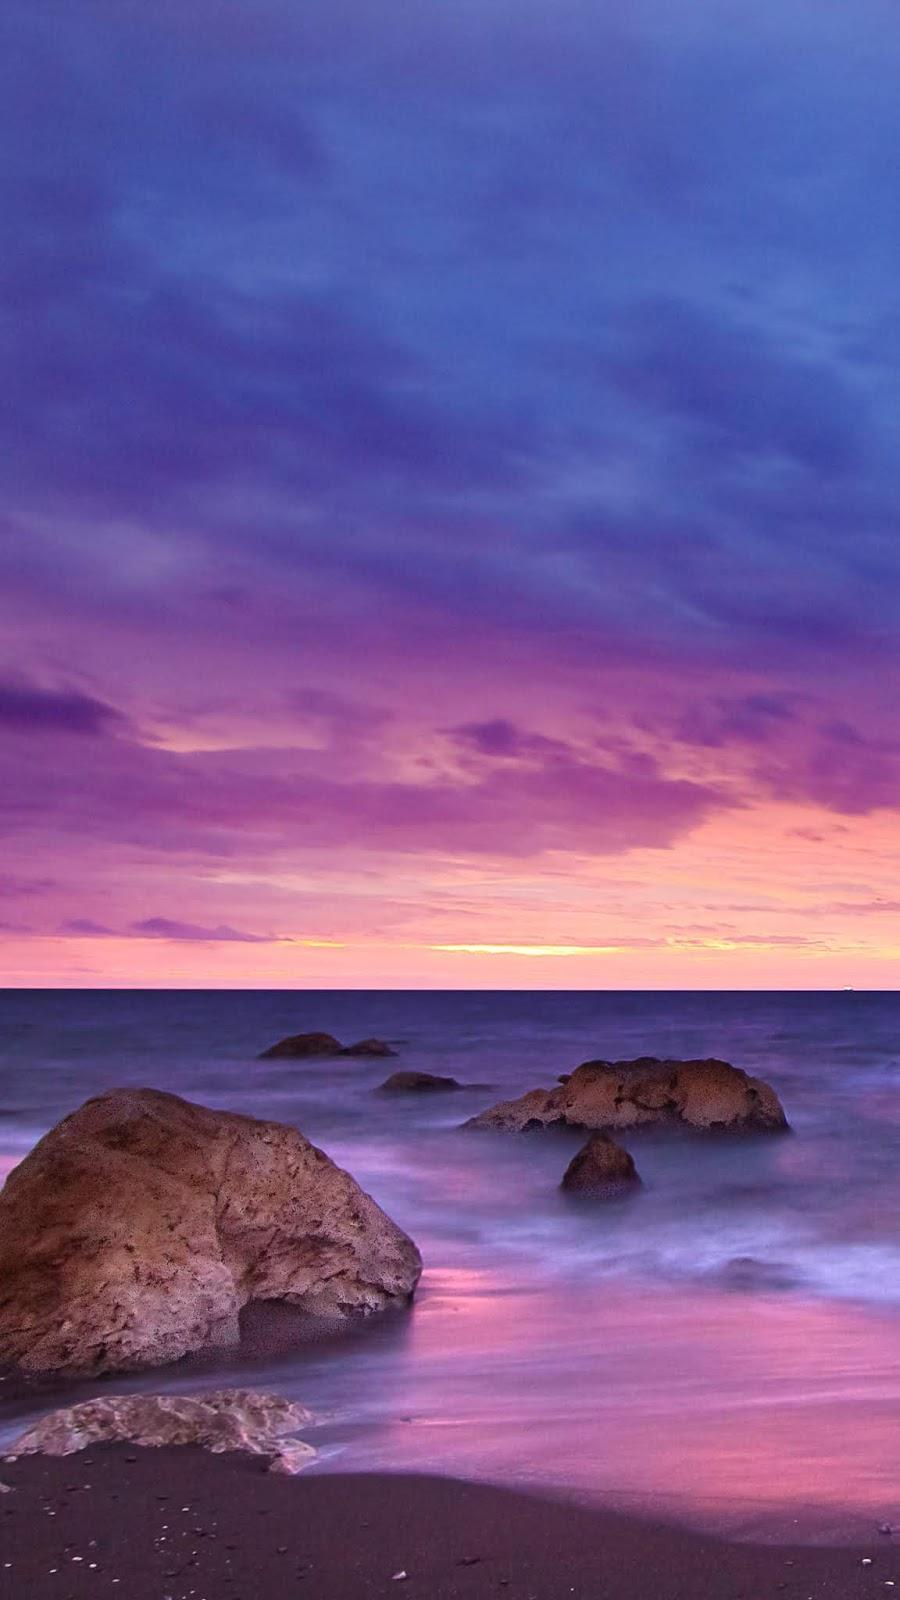 Twilight sunset in the beach